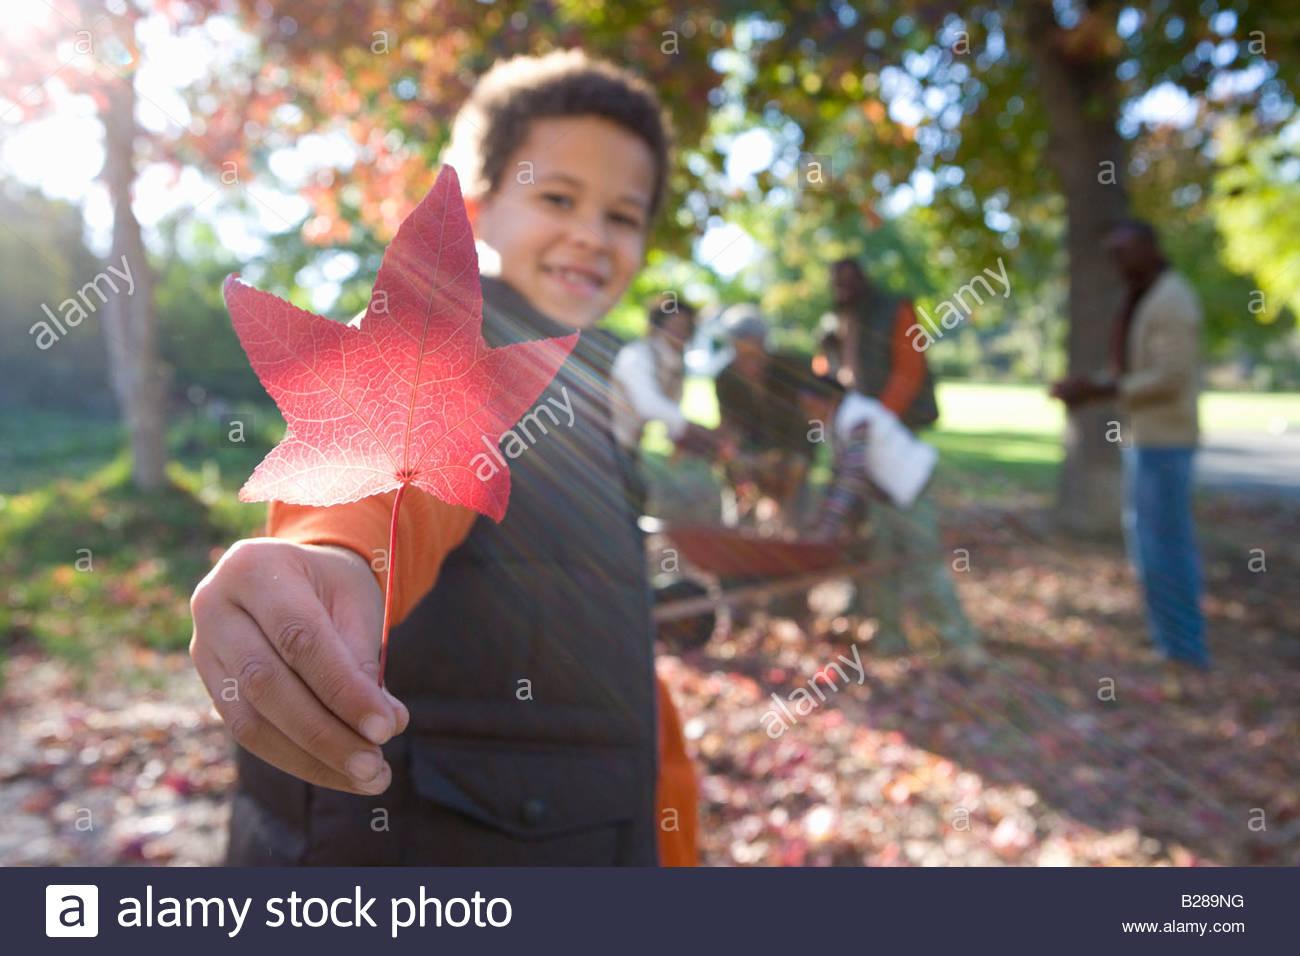 Multi-generational family doing yard work in autumn - Stock Image